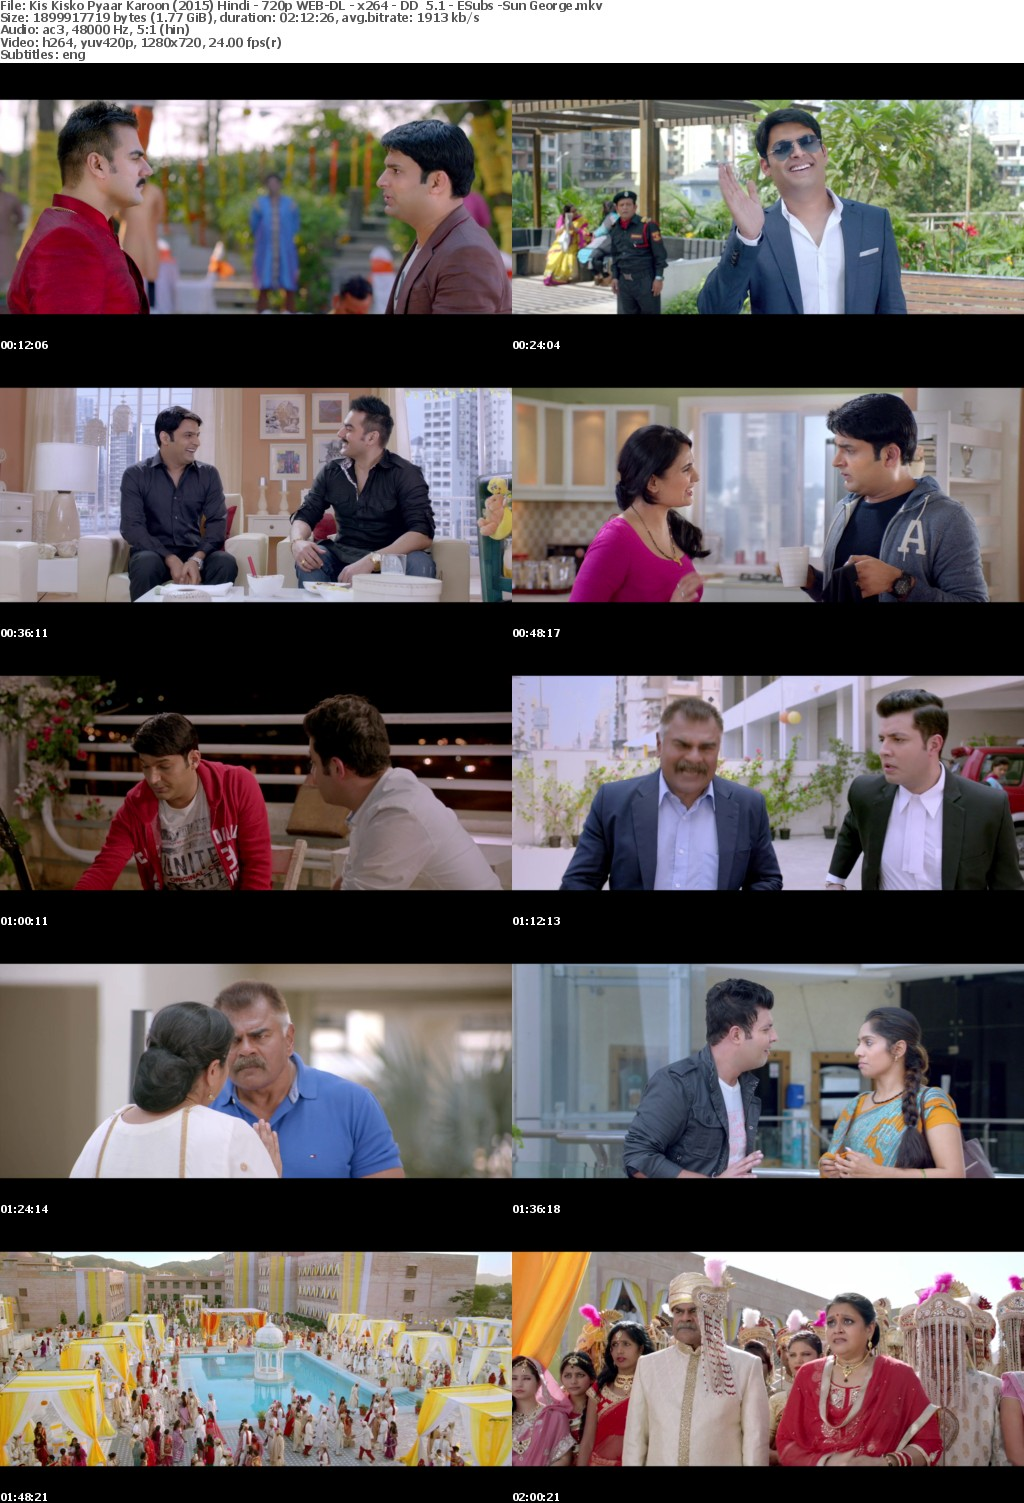 Kis Kisko Pyaar Karoon (2015) Hindi - 720p WEB-DL - x264 - DD 5.1 - ESubs -Sun Ge...